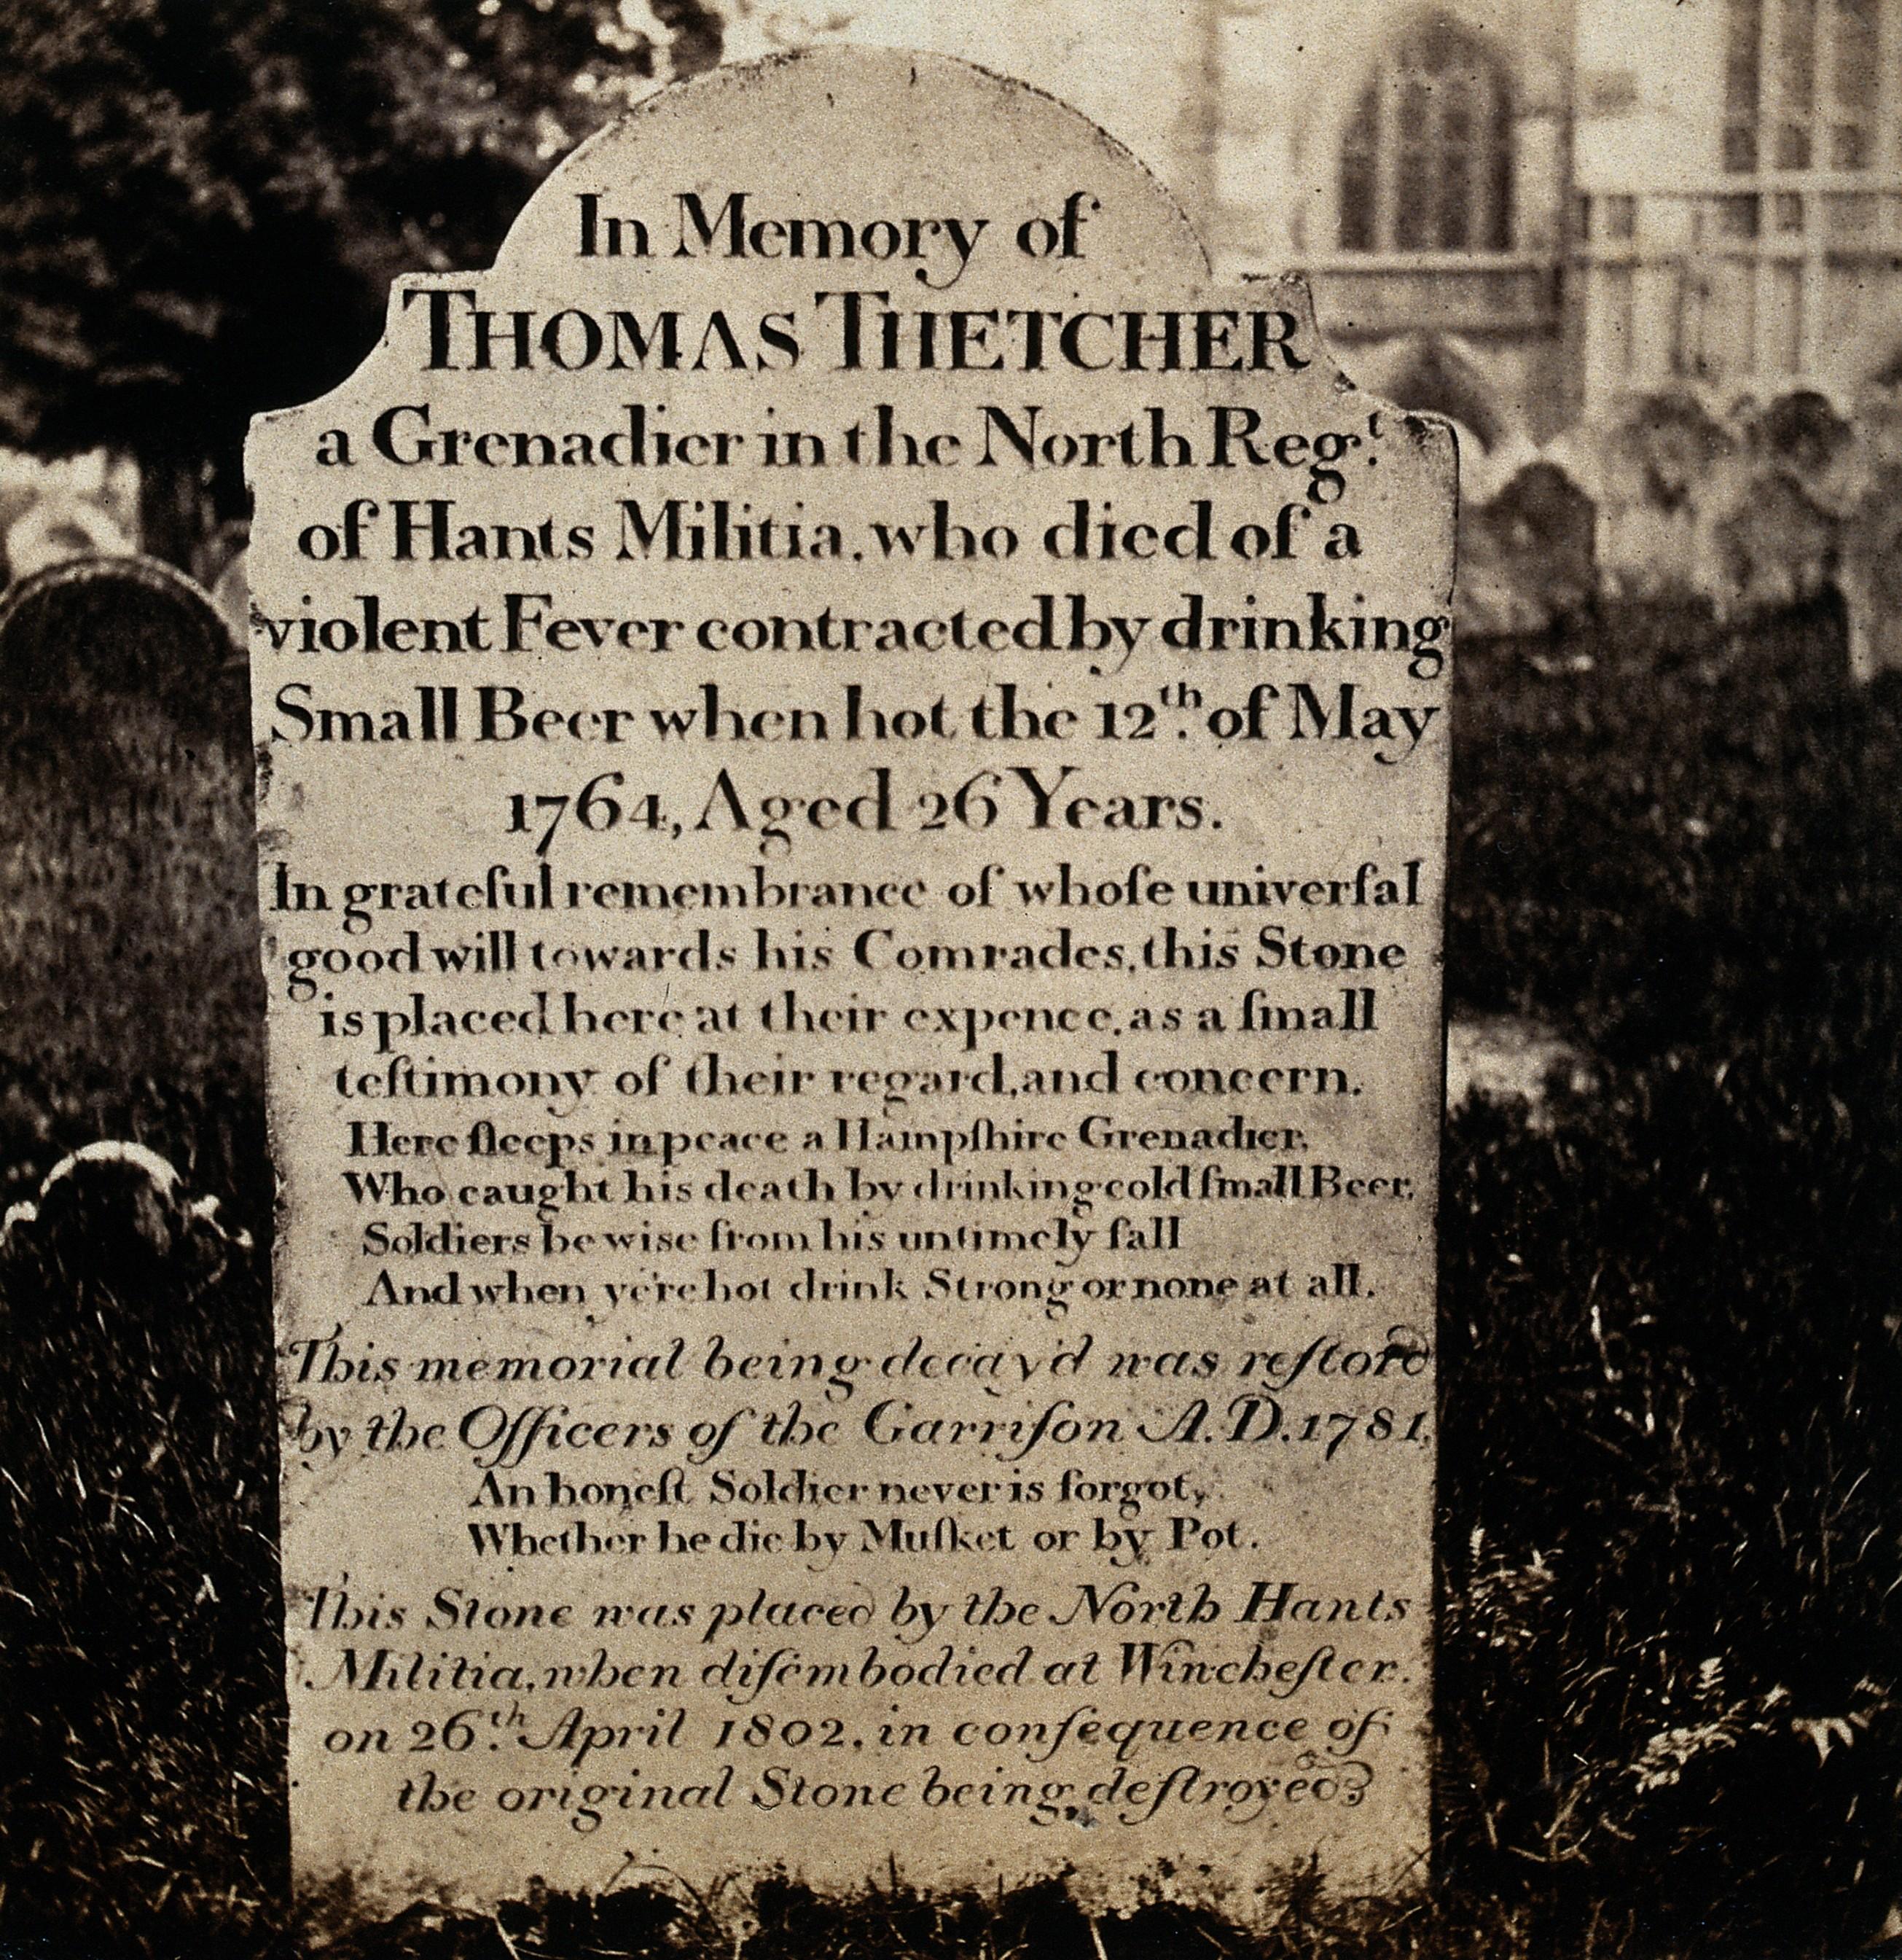 Thomas Thetcher Gravestone